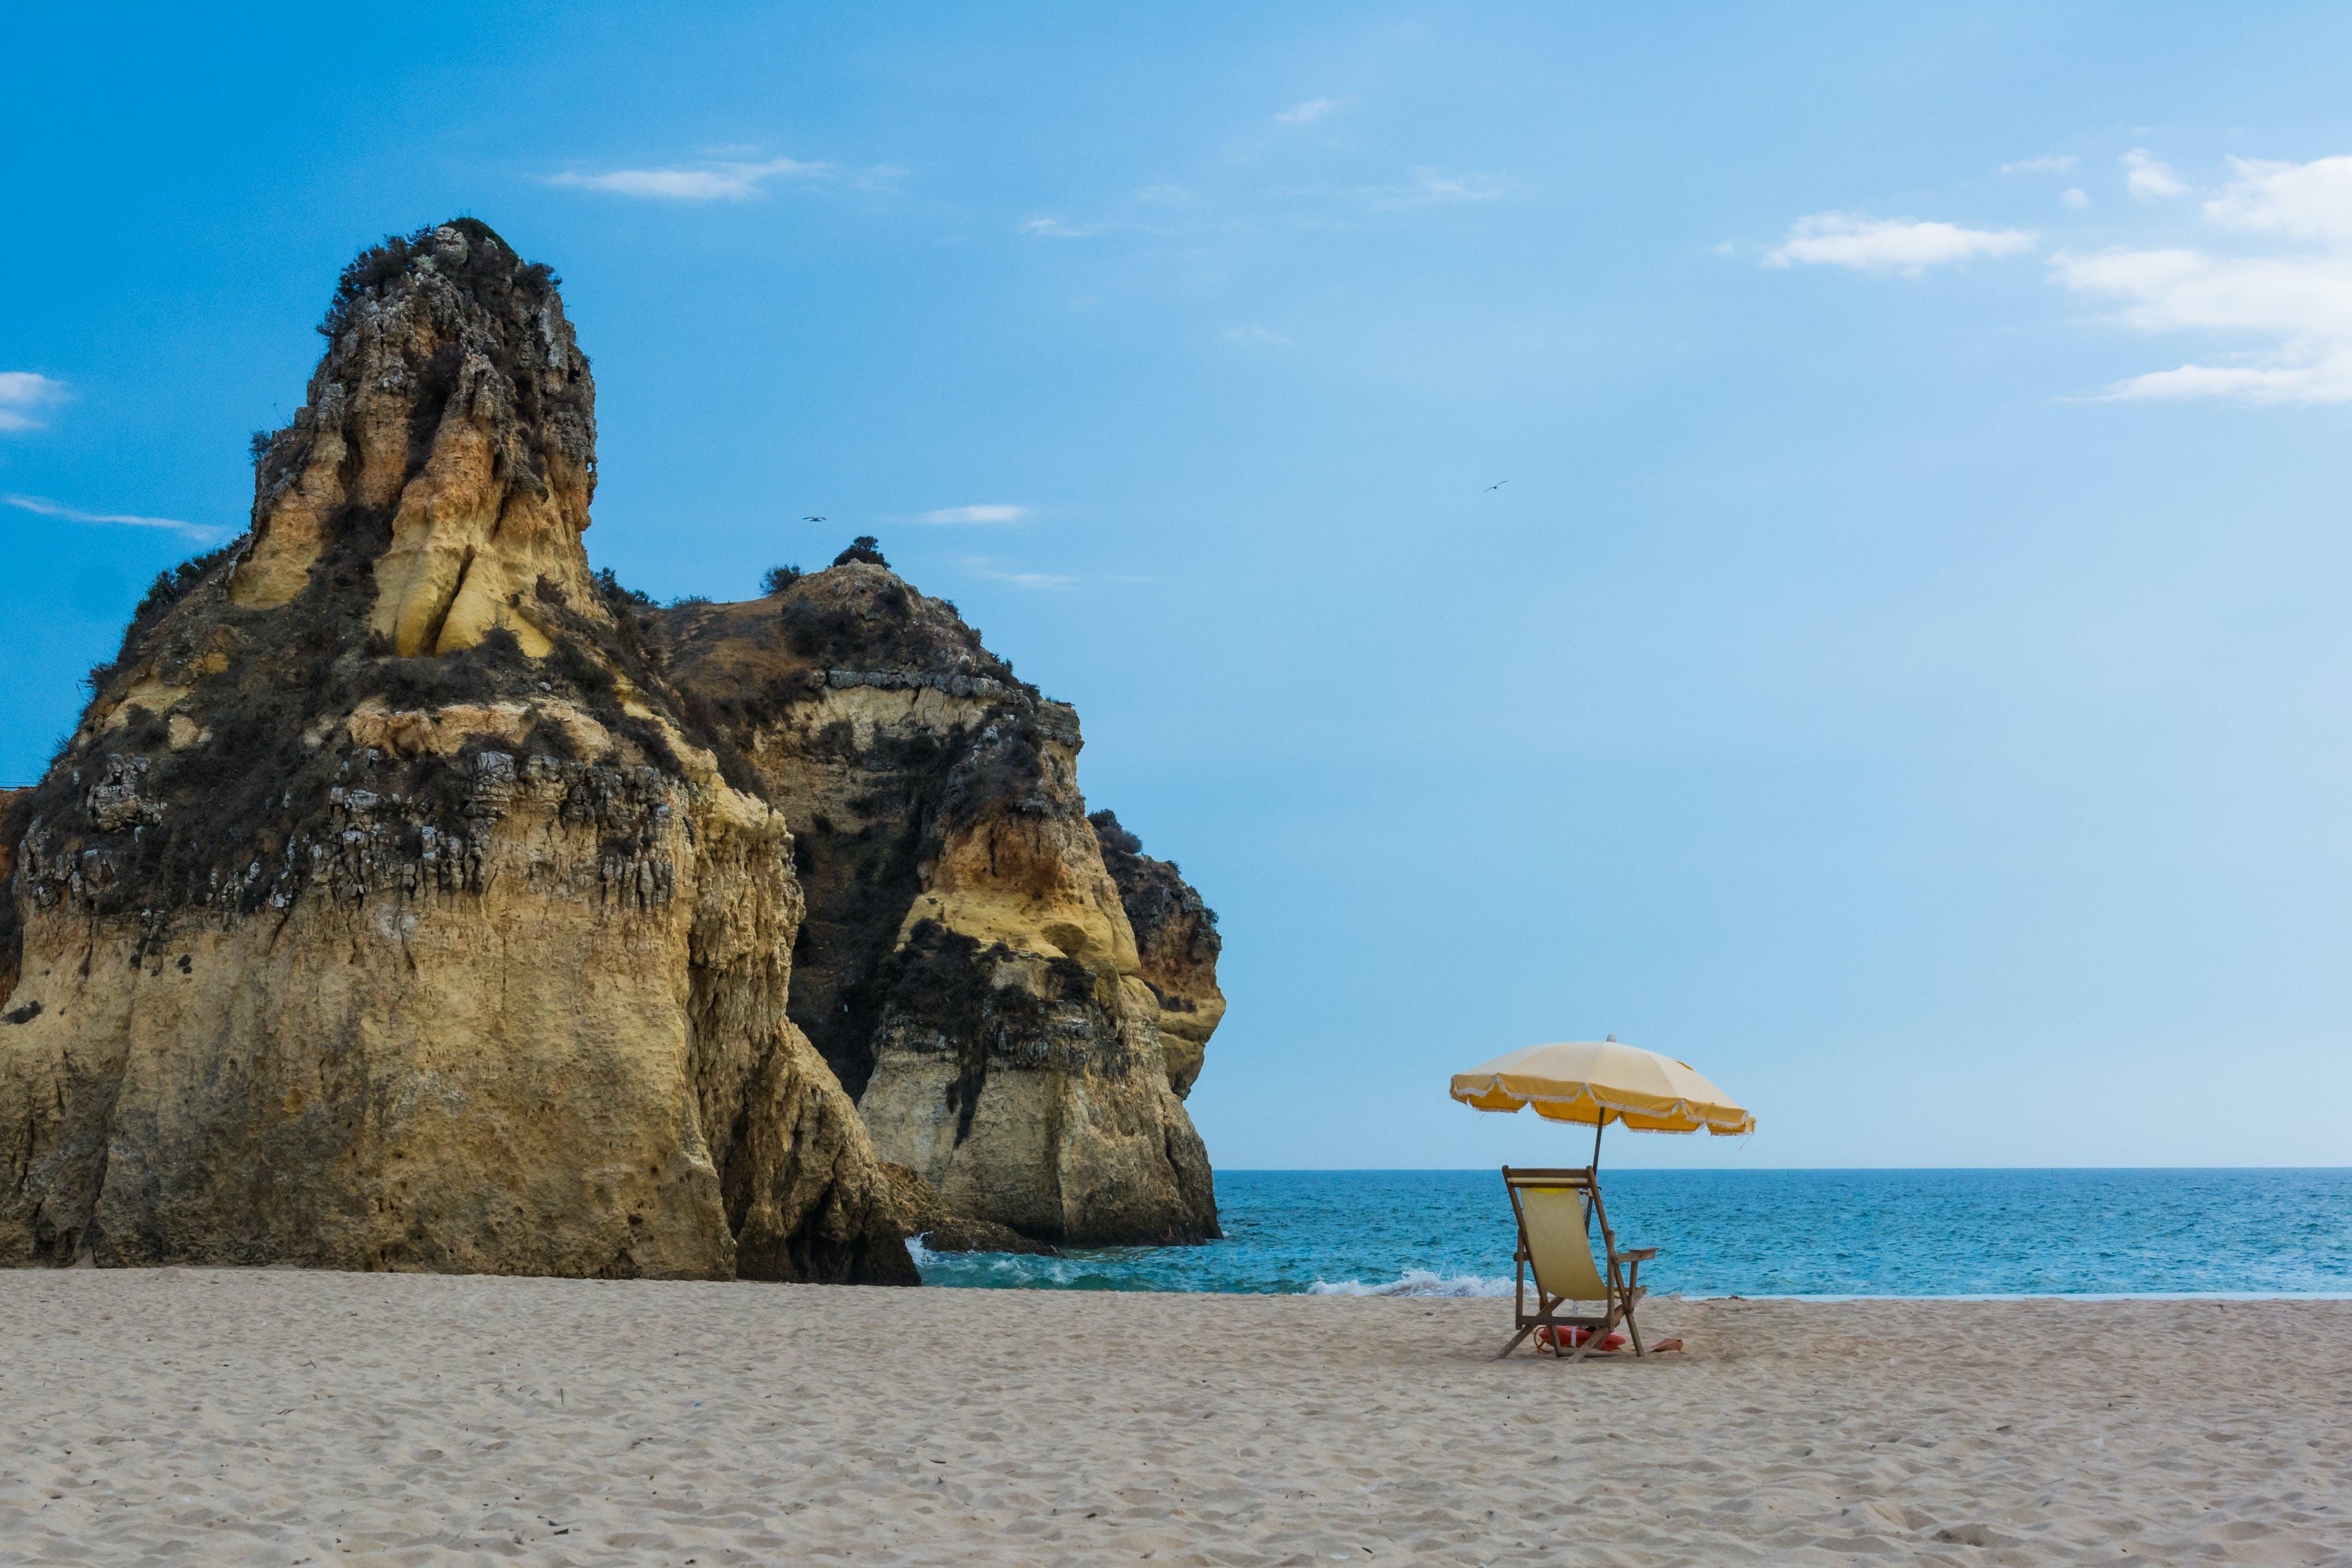 Brown Patio Umbrella Beside Shore Sand